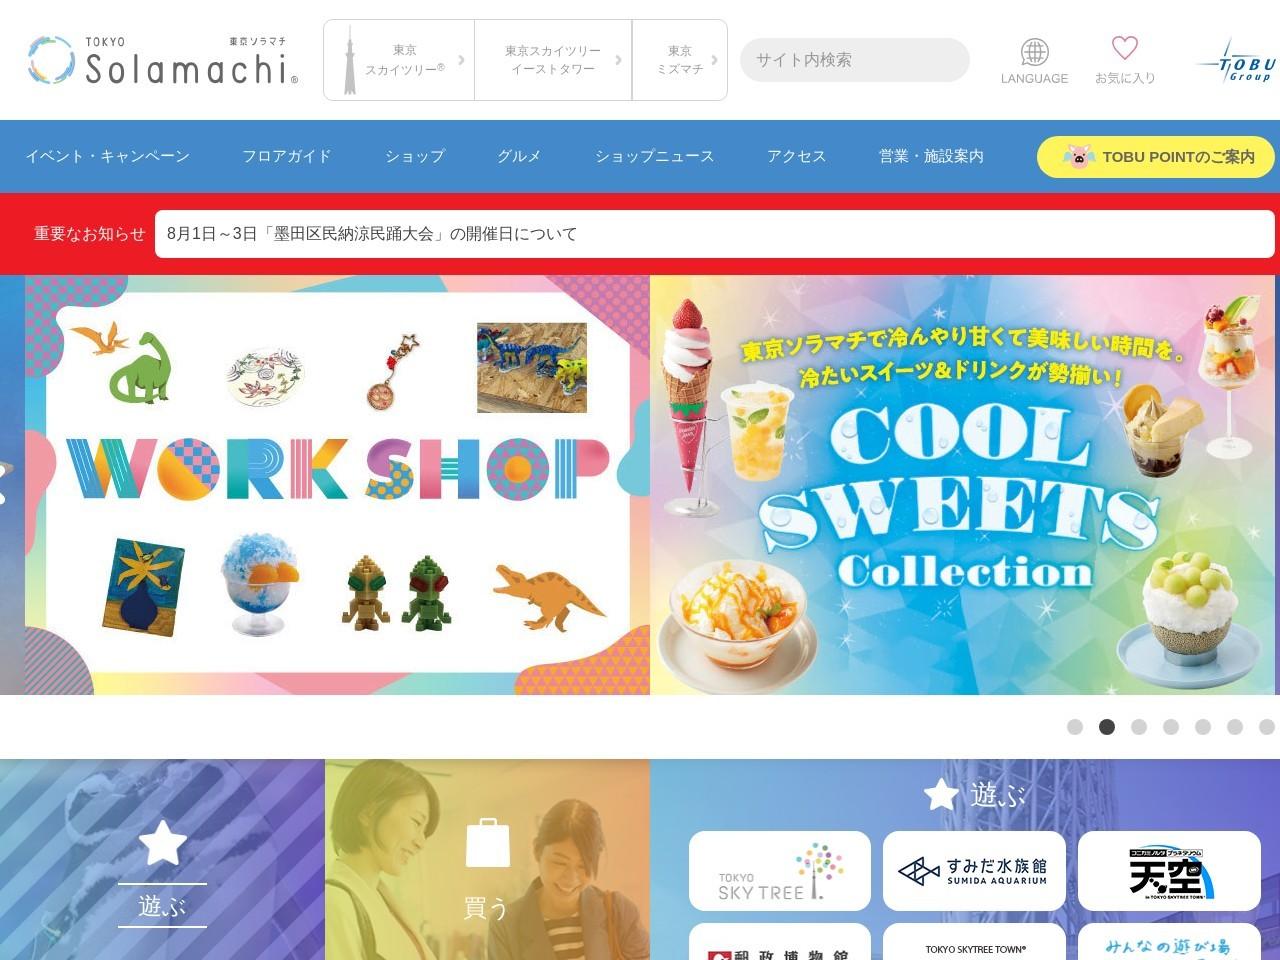 http://www.tokyo-solamachi.jp/event/1301/